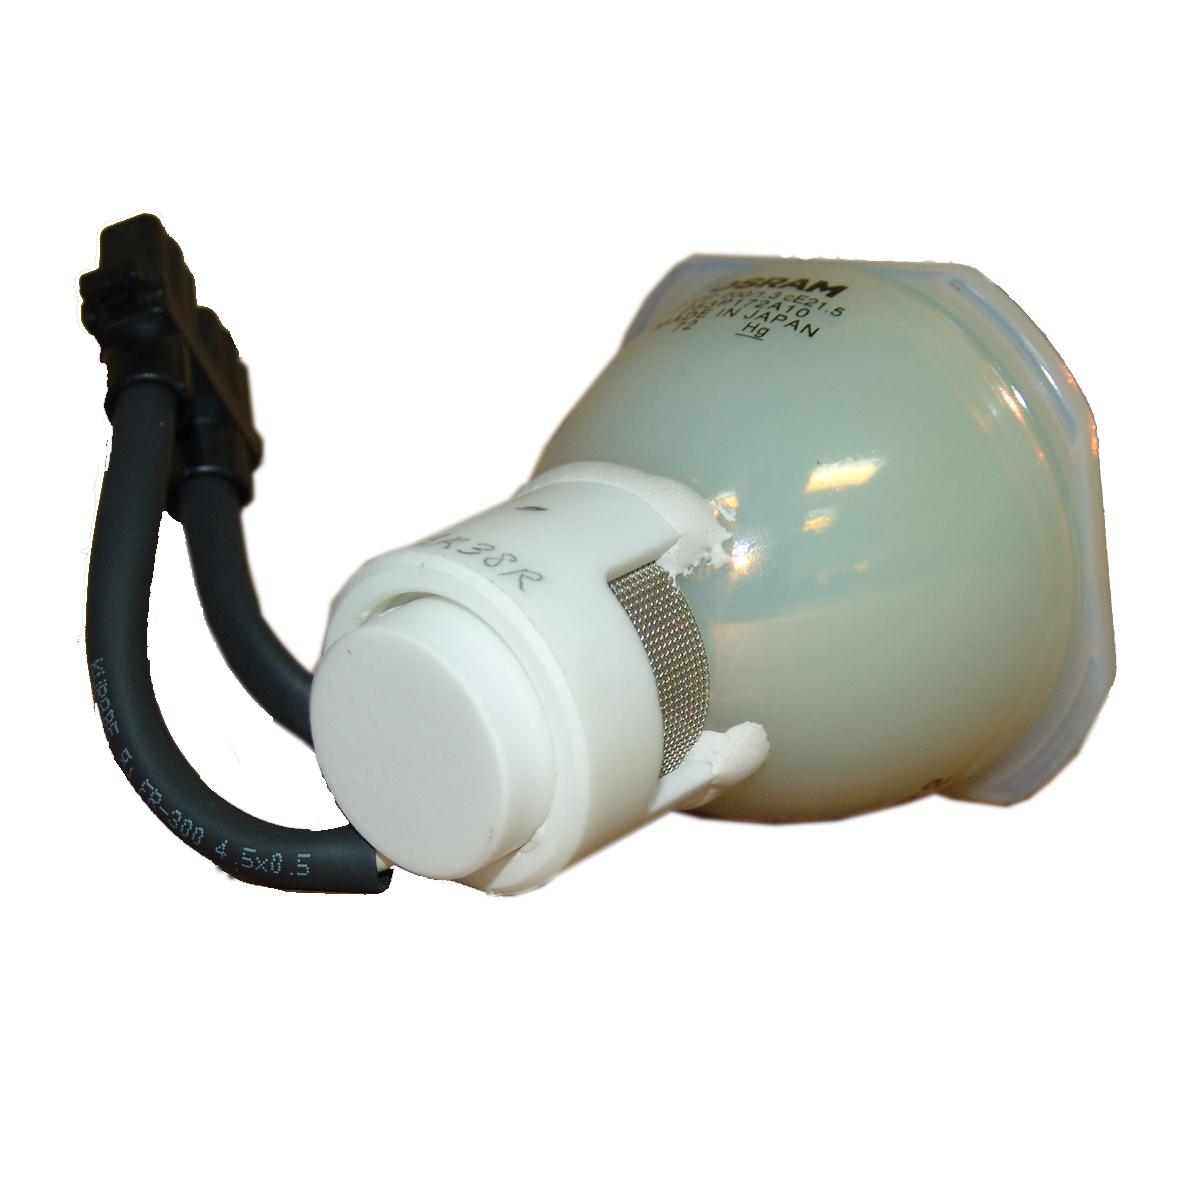 Original Osram Projector Lamp Replacement for Saville AV REPLMP123 (Bulb Only) - image 3 de 5